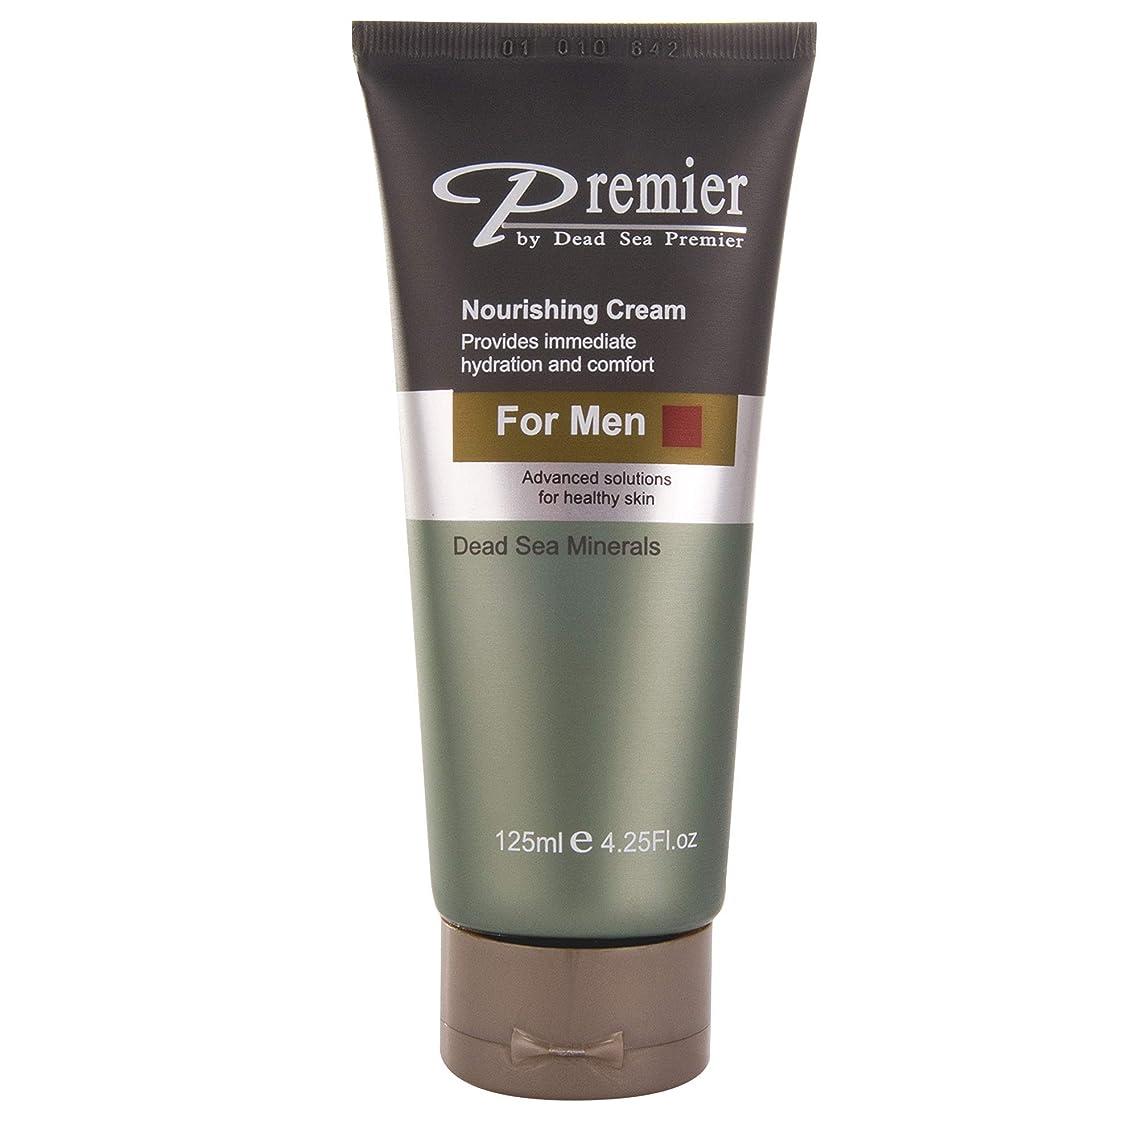 Premier Dead Sea Classic Nourishing Cream for Men, best looking skin